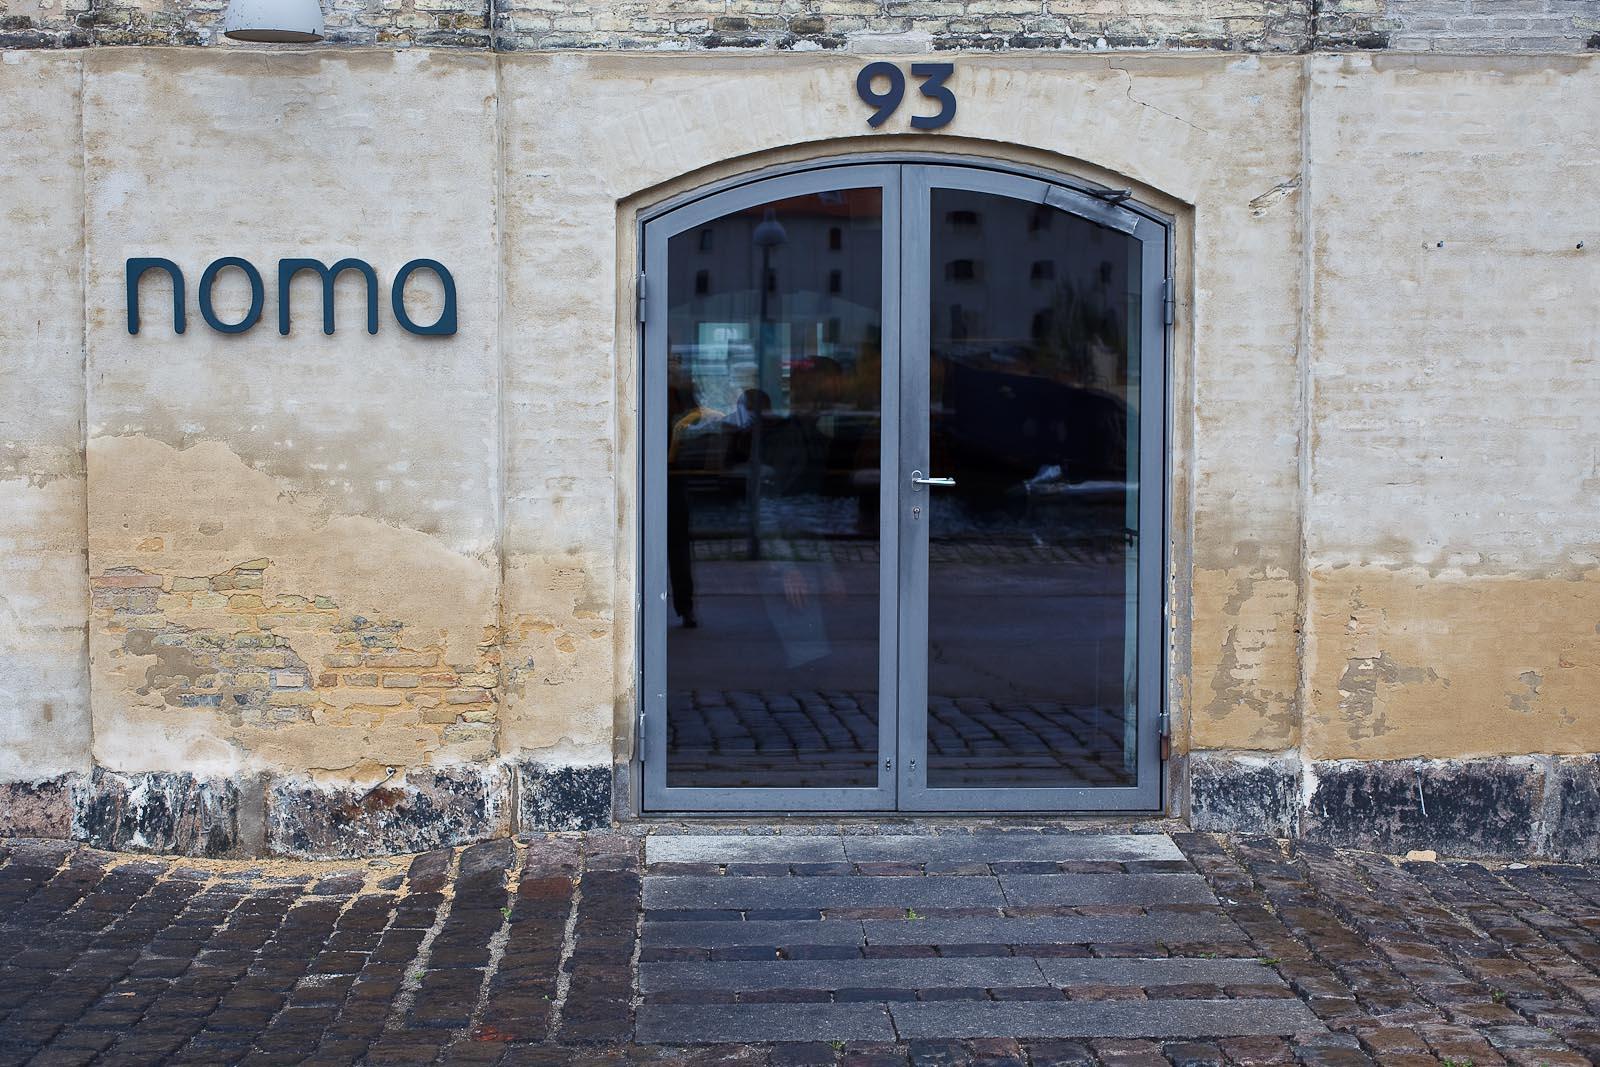 Noma - Entrance to Restaurant